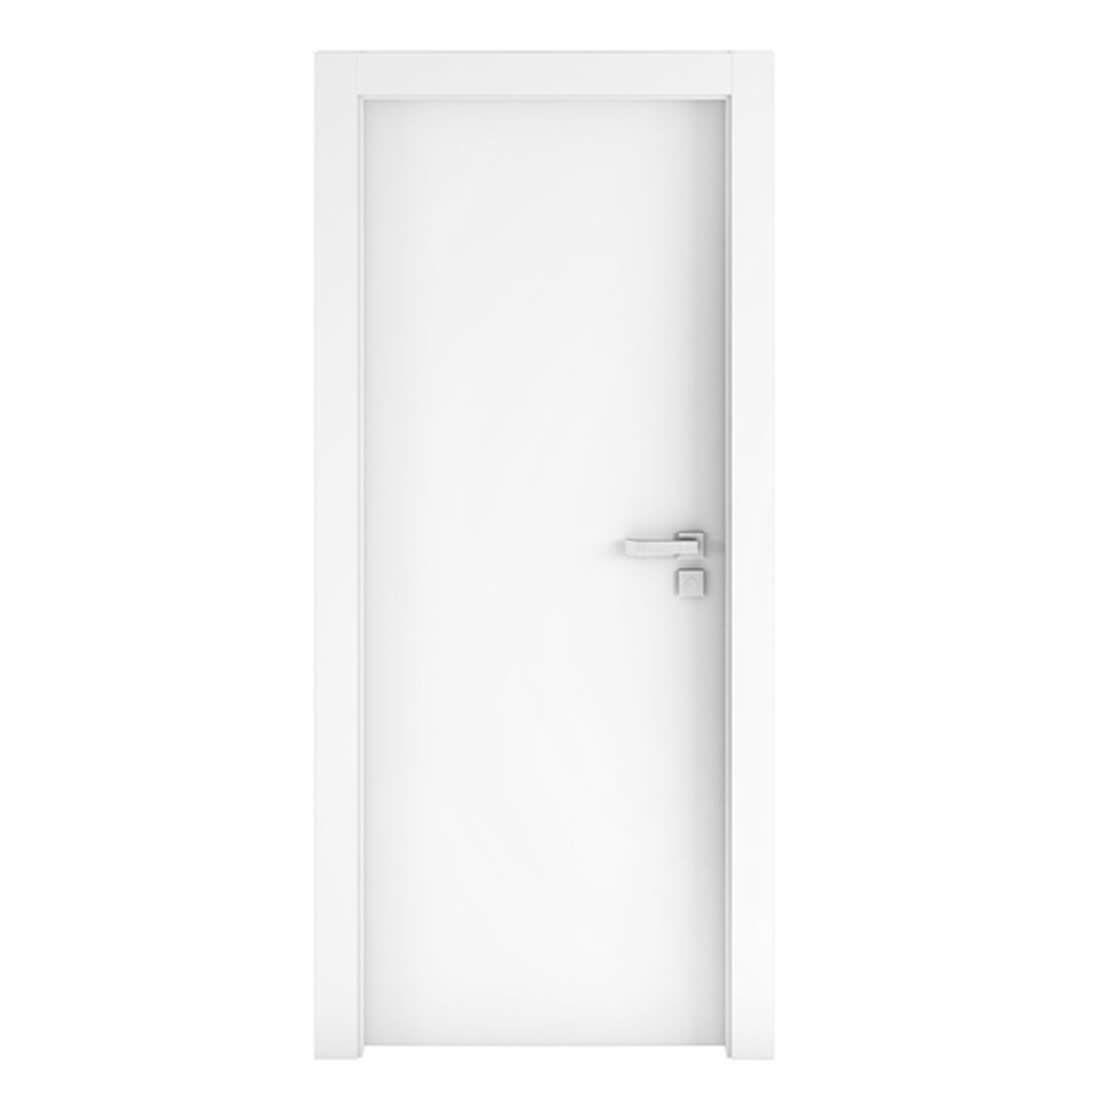 Kit Porta Concrem Wood 2,10 x 0,80 x 3,5 cm Esquerda Branca